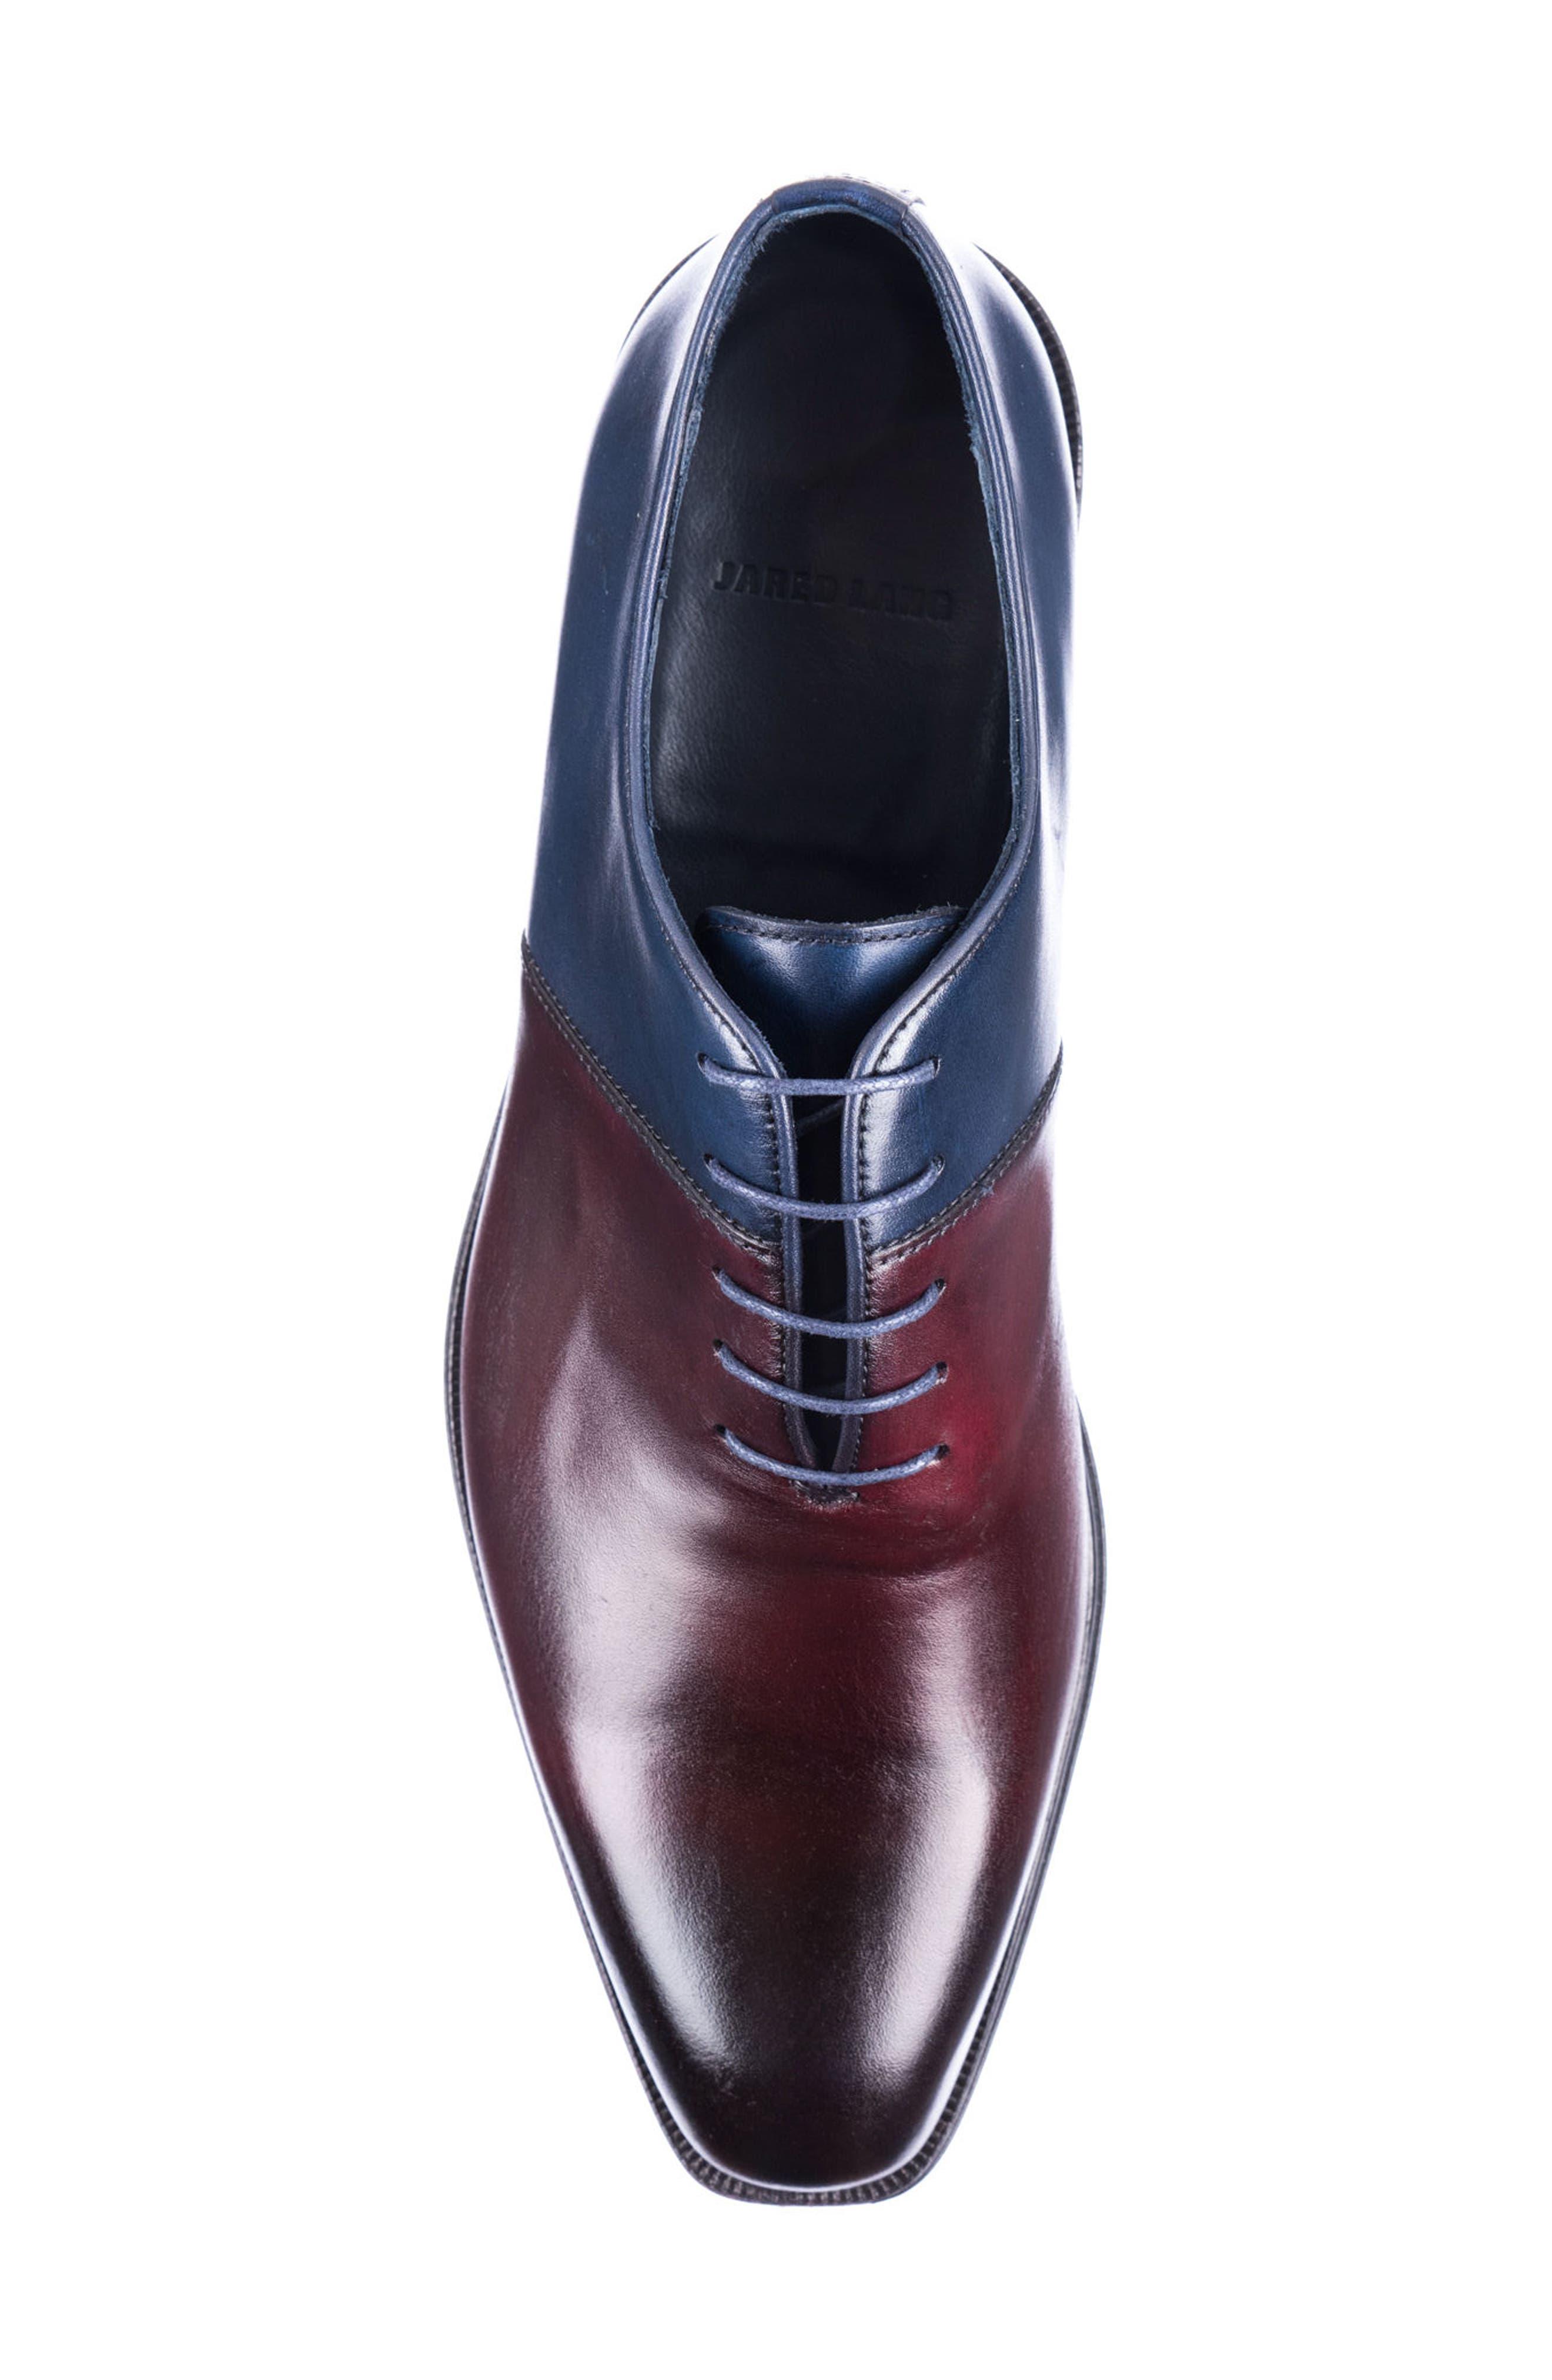 Wyatt Colorblocked Whole Cut Shoe,                             Alternate thumbnail 5, color,                             Burgundy Leather